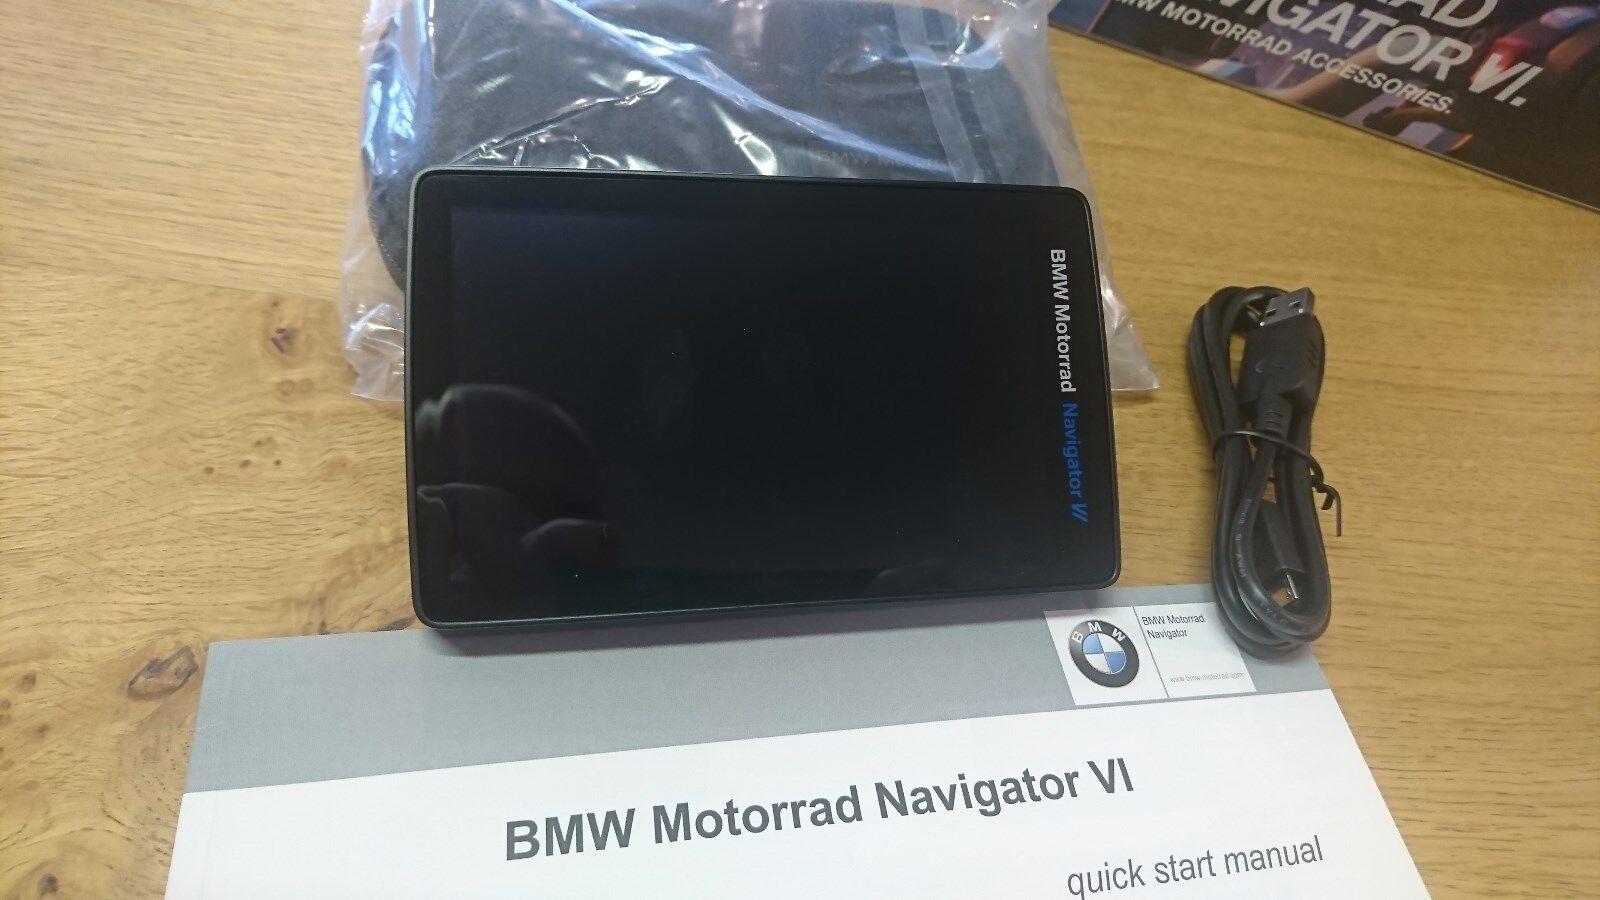 bmw motorrad navigator vi 6 sat nav garmin gps bike motorcycle ebay rh ebay co uk BMW Motorrad Navigator Wiring BMW Motorrad Navigator Color Map